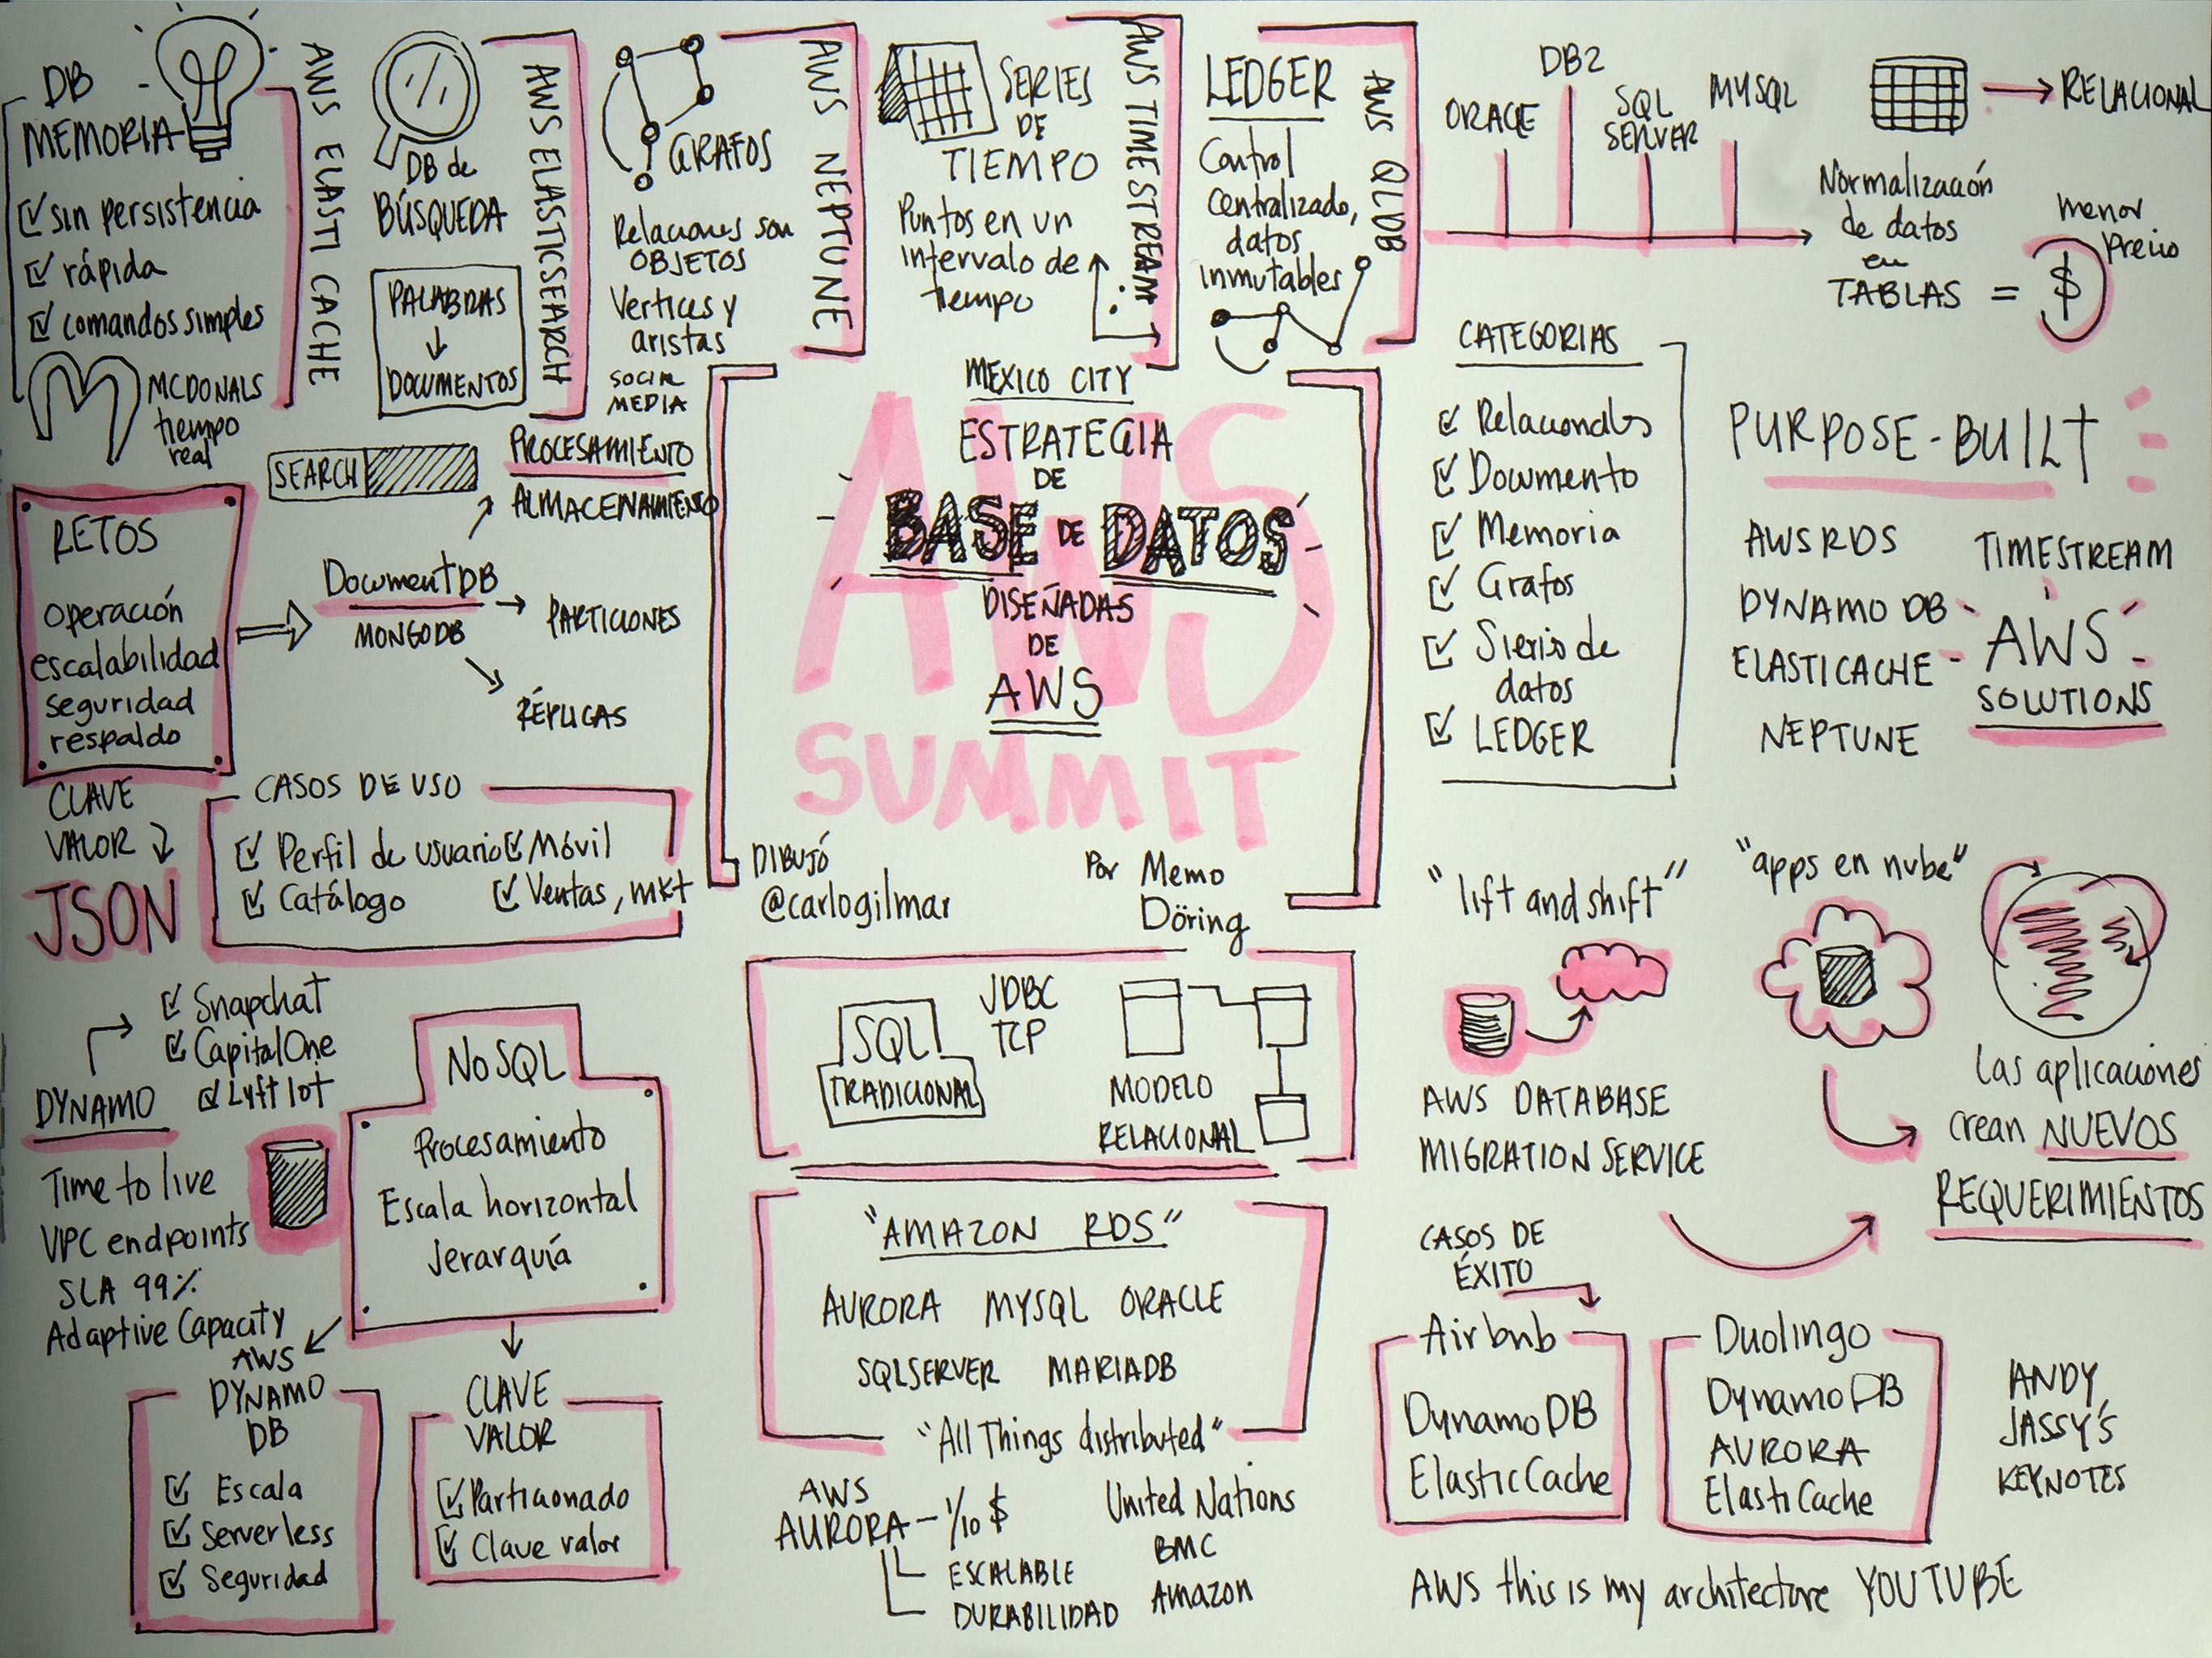 AWS-Purpose-Built-Database-Strategy.jpg